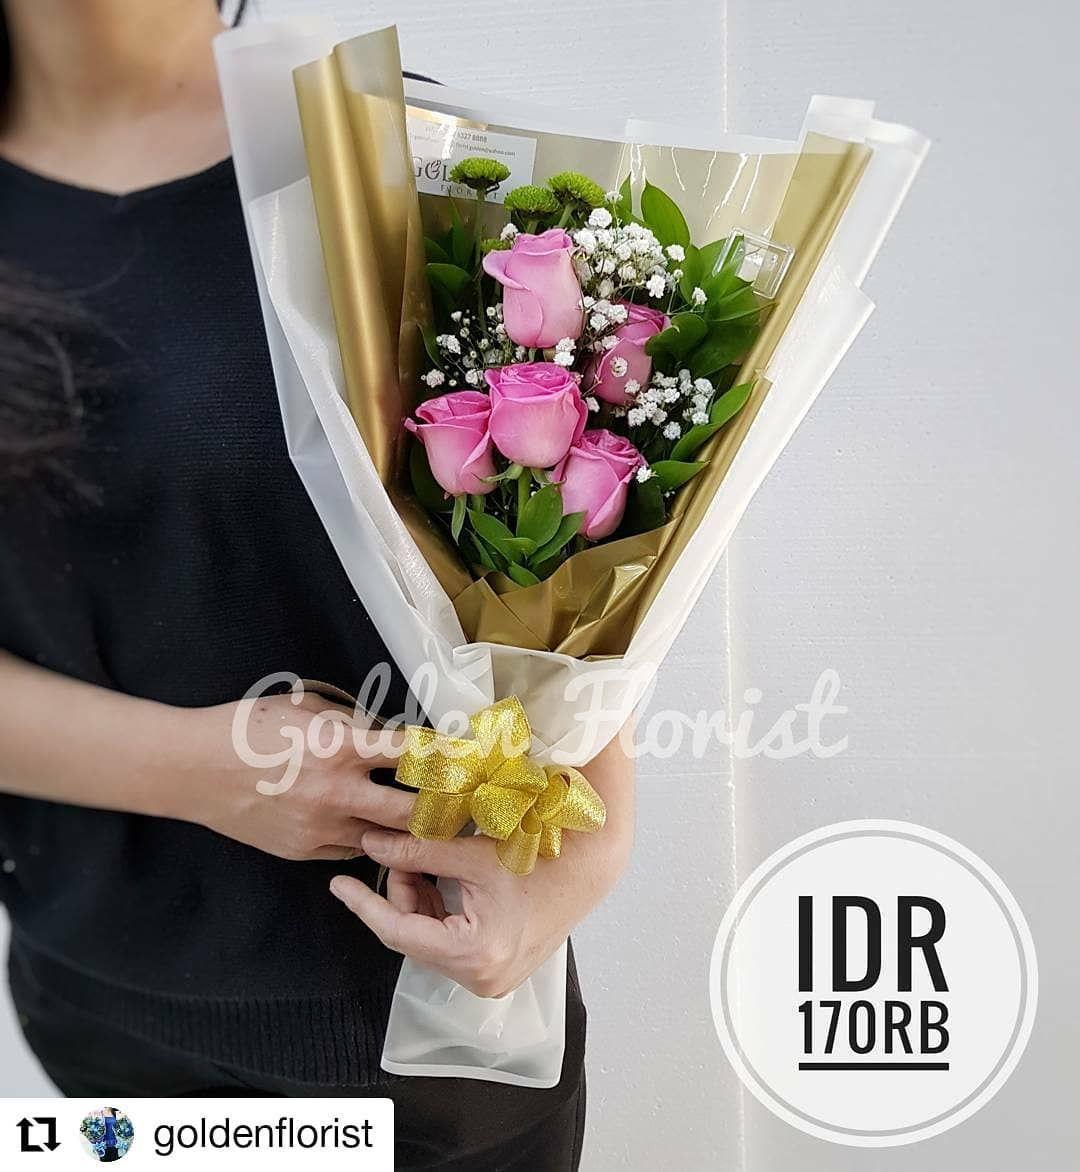 #Repost @goldenflorist • • • • • • Fresh pink roses bouquet Golden florist redi stok bunga fresh dan bunga palsu  Same day delivery available  Wa us to check what we have in stock  Wa 0823 6327 8888 Line @goldenflorist  #beauty #instamood #beautyful #style #girlsjustwannahavefun #modernlife #anakhits #anaksekolahan #kekinian #kekinianbanget #anakgaul #masakini #anakhitz #happiness #bungamurah #bunga #bungawisuda #bungamawar #bungapalsu #bungawisudamurah #jualbunga #buketbunga #buketbungapalsu #b